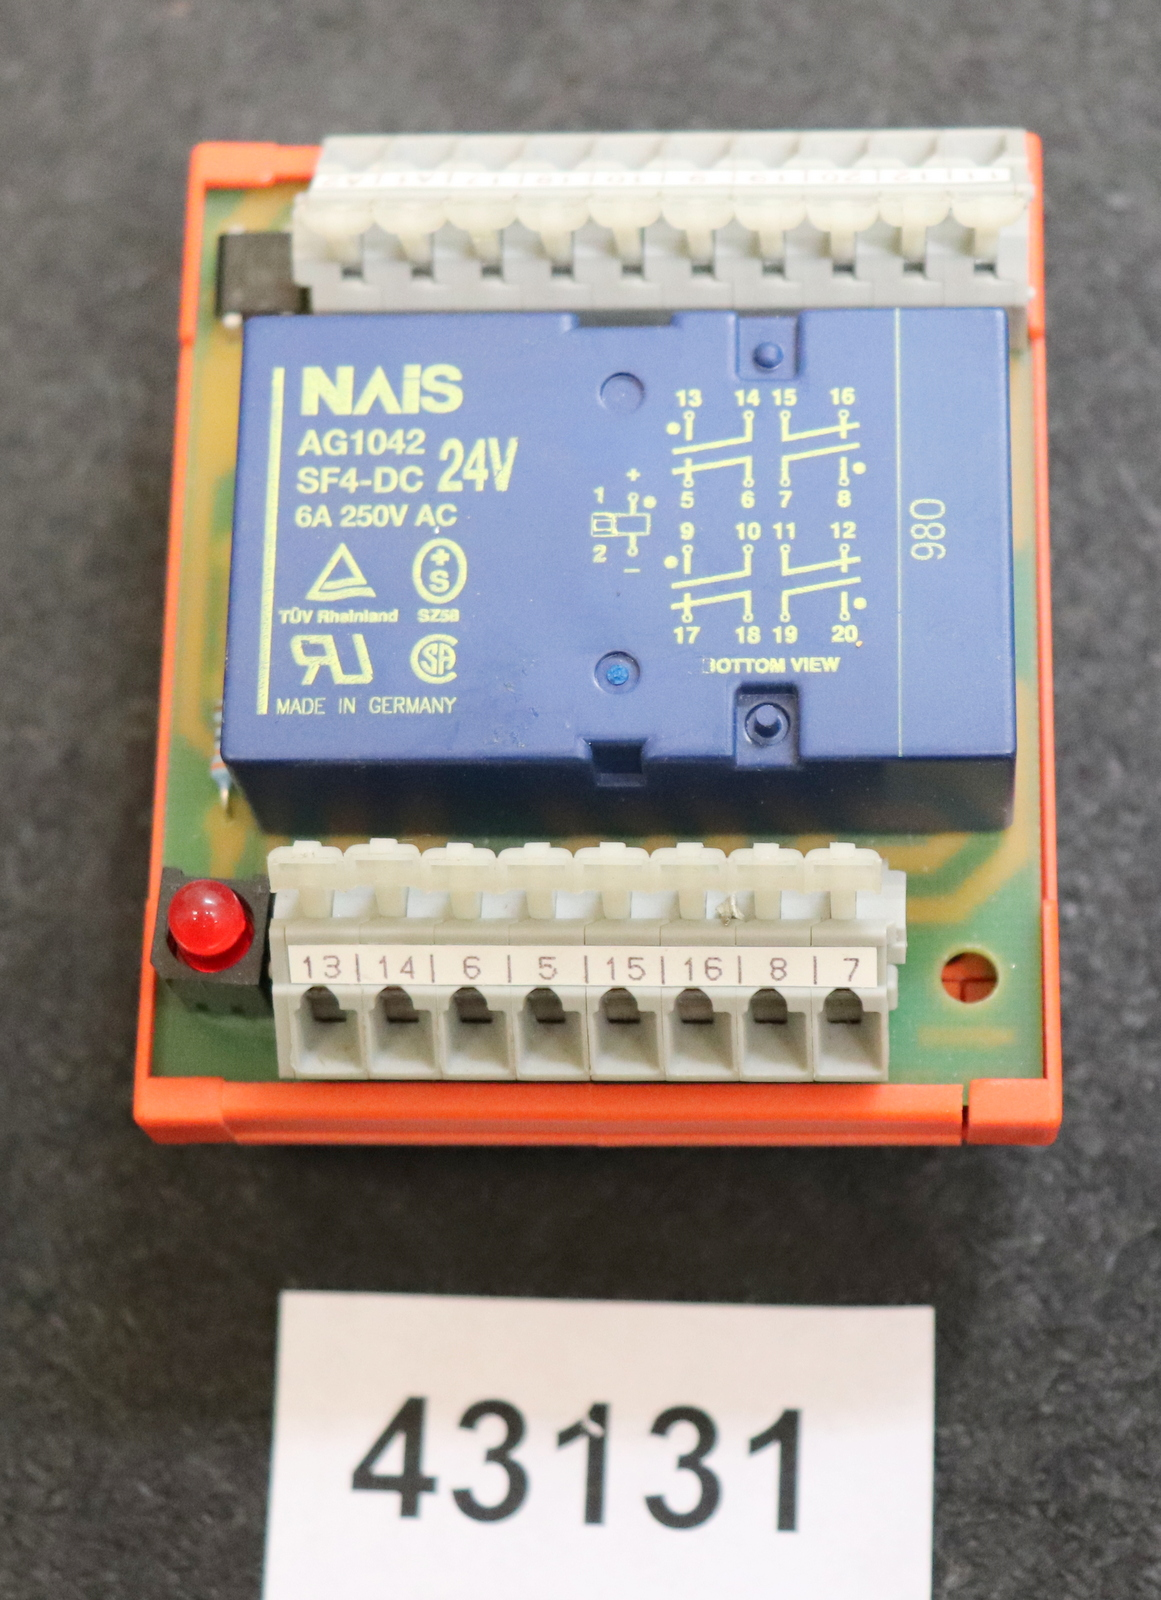 Wago Relay Board Modul Din Rail Mount 139 288 Mit 18 Ports Nais Circuit Mounting Bracket For Ebay 1 Sur 8 Ag1042